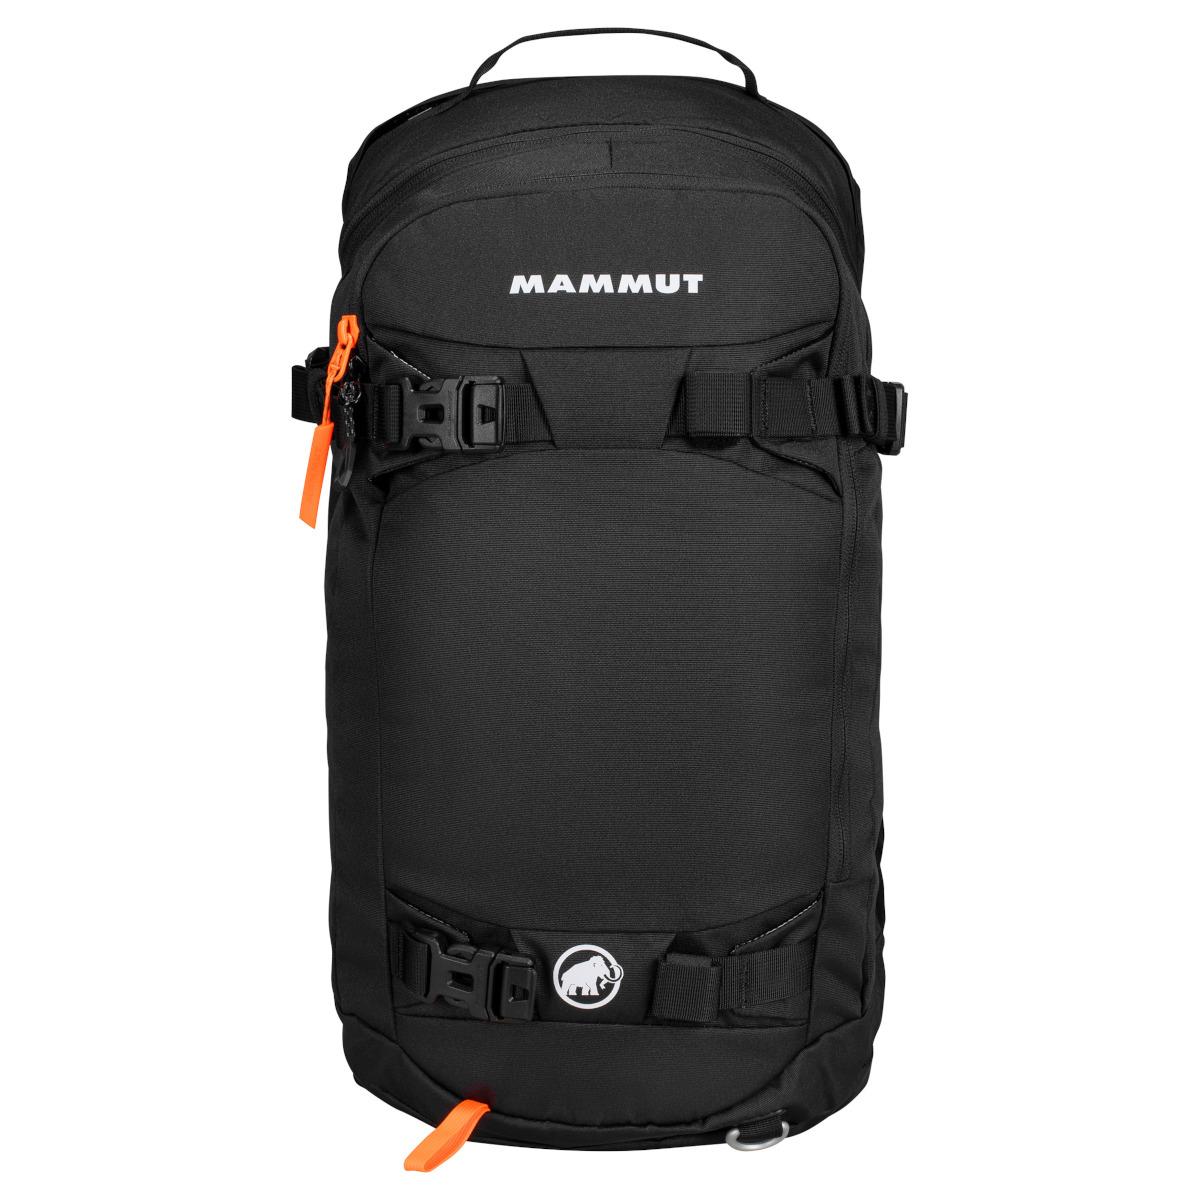 Mammut Nirvana 25 Backpack - black